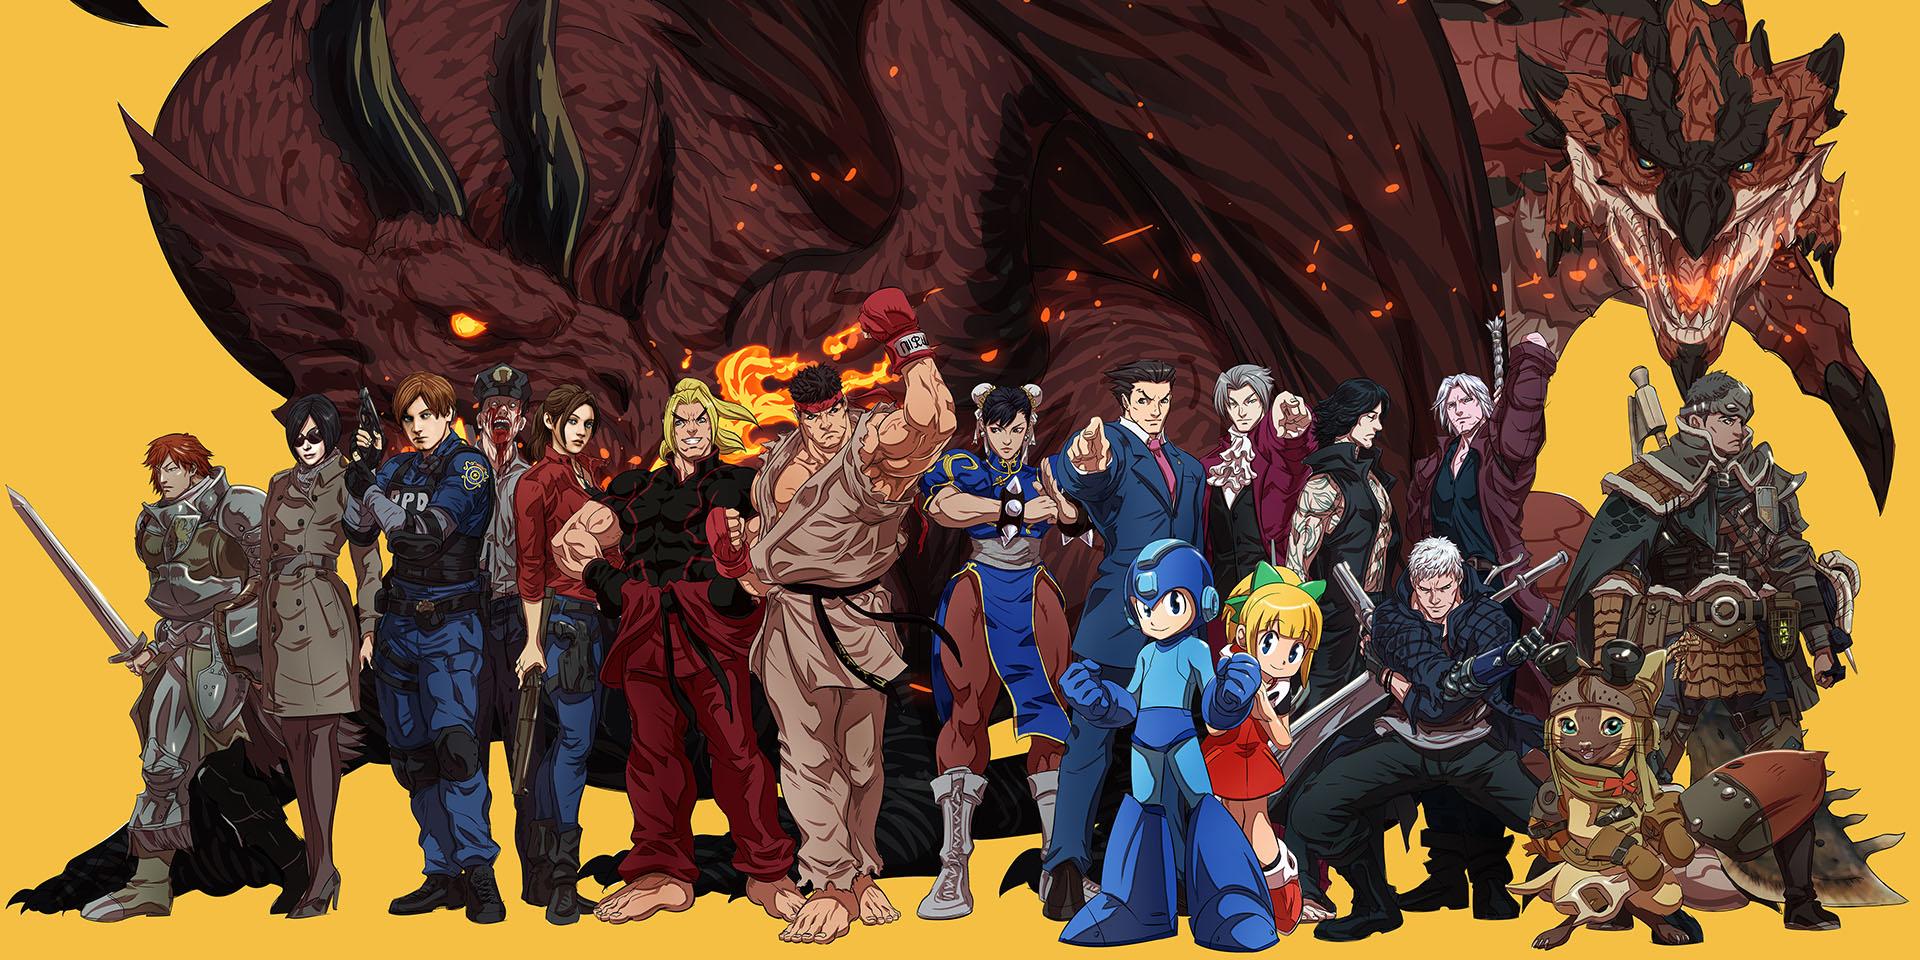 Image by: Capcom ( https://images.app.goo.gl/EUmv2BEhsxTDYzjW9 )